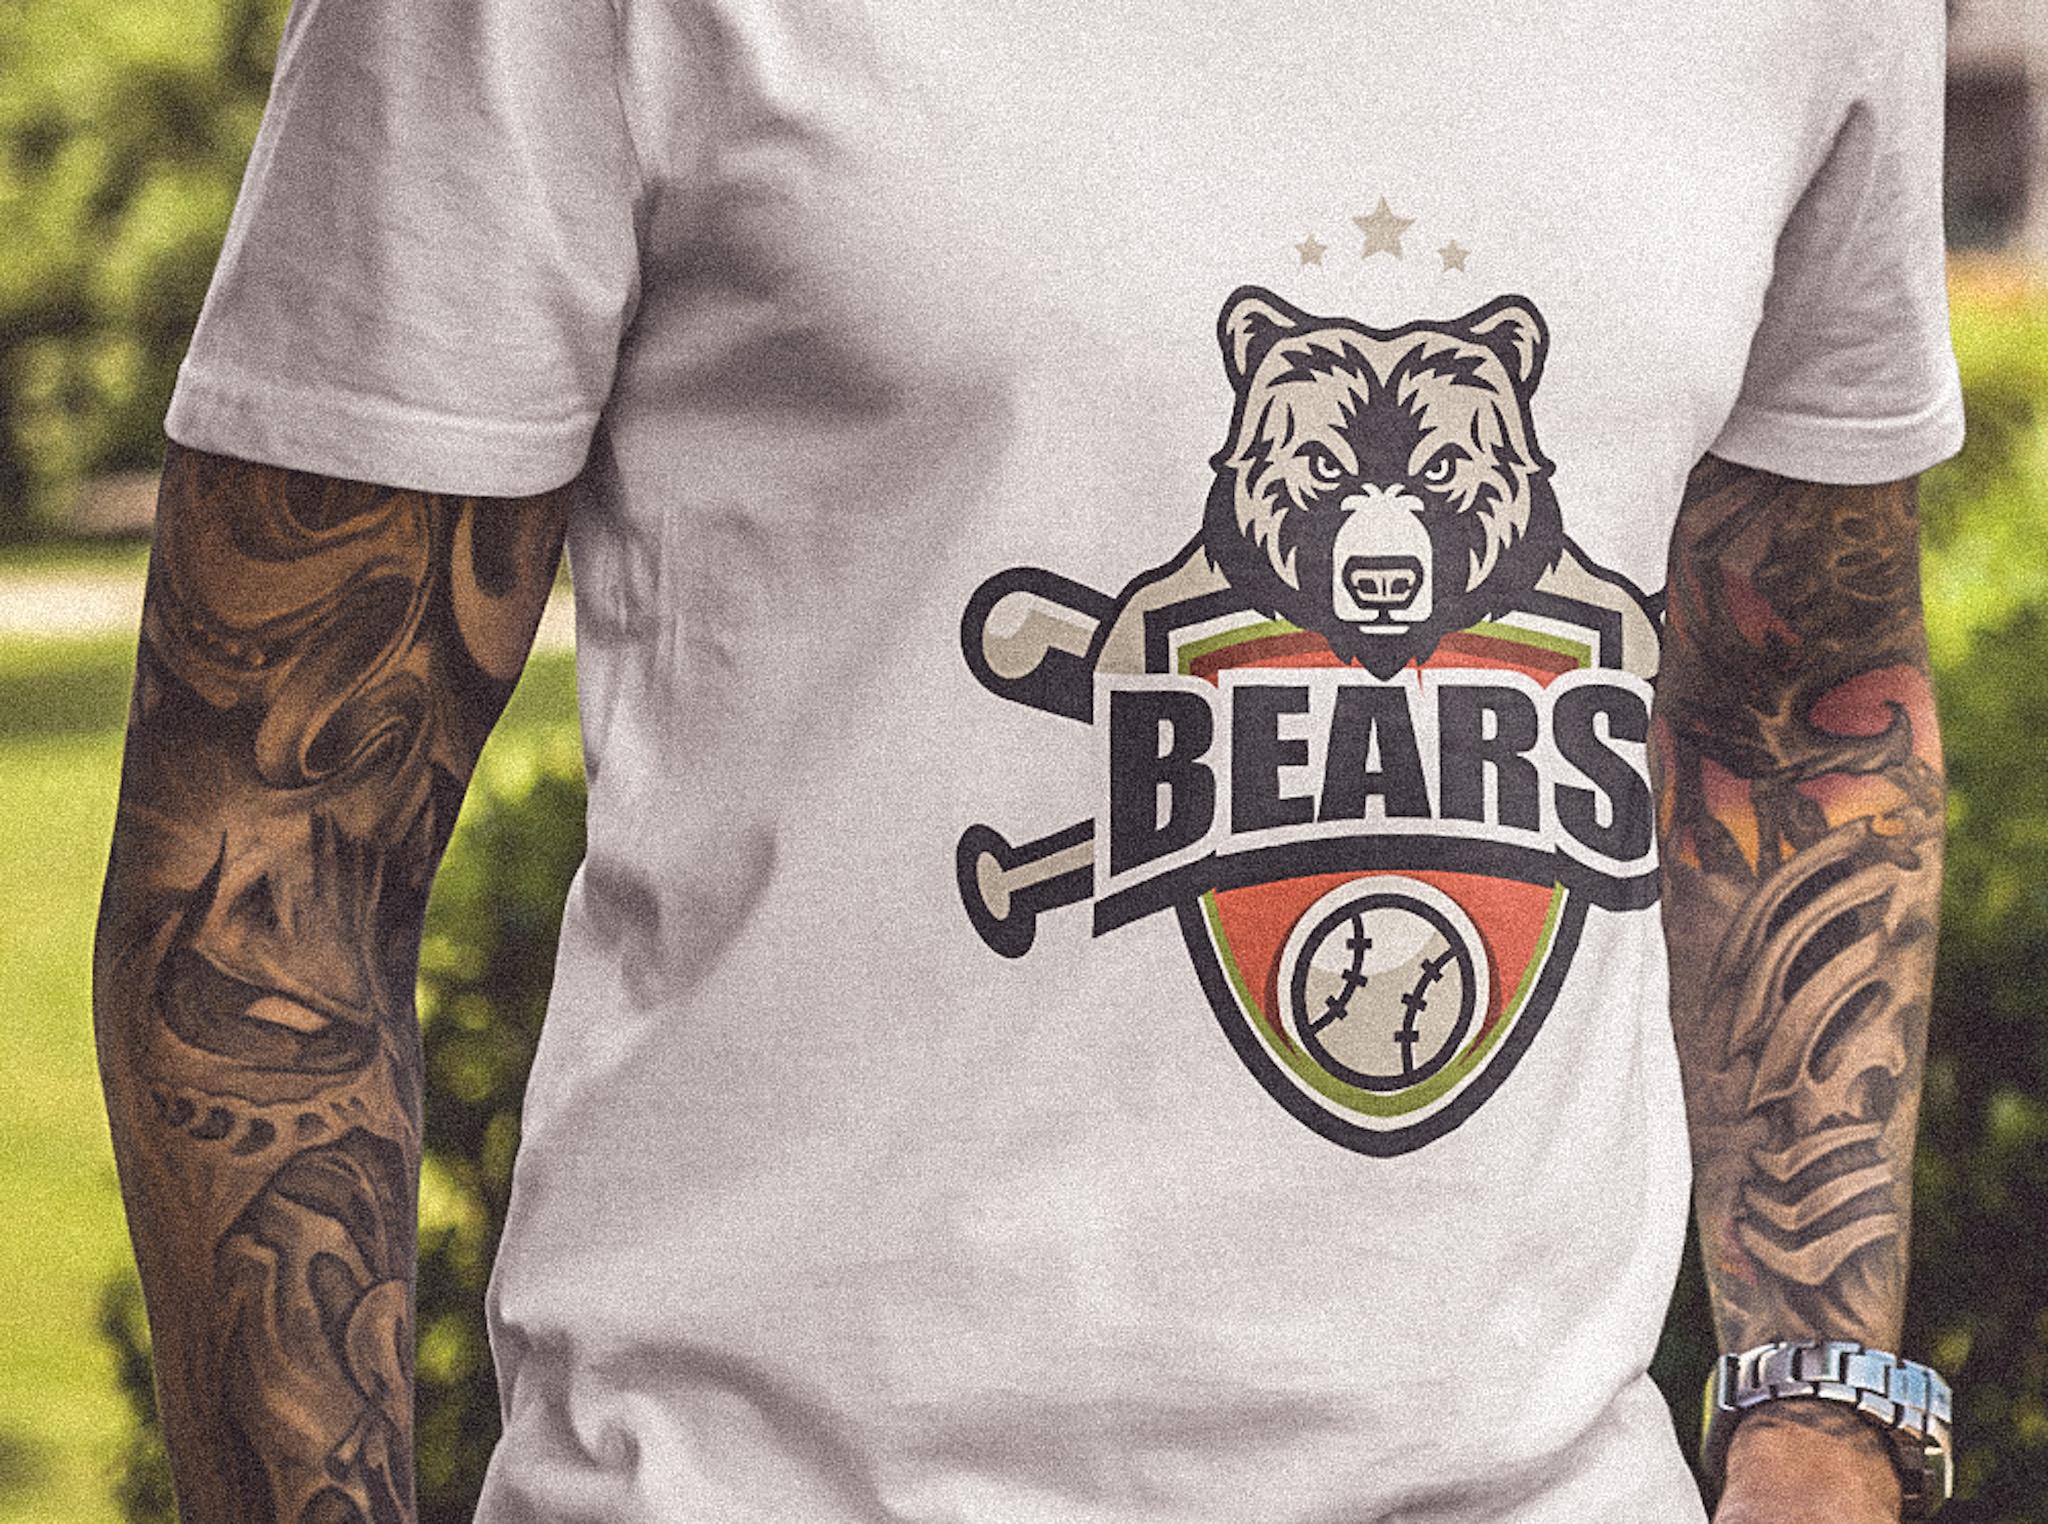 Bears B.S.C. logo design